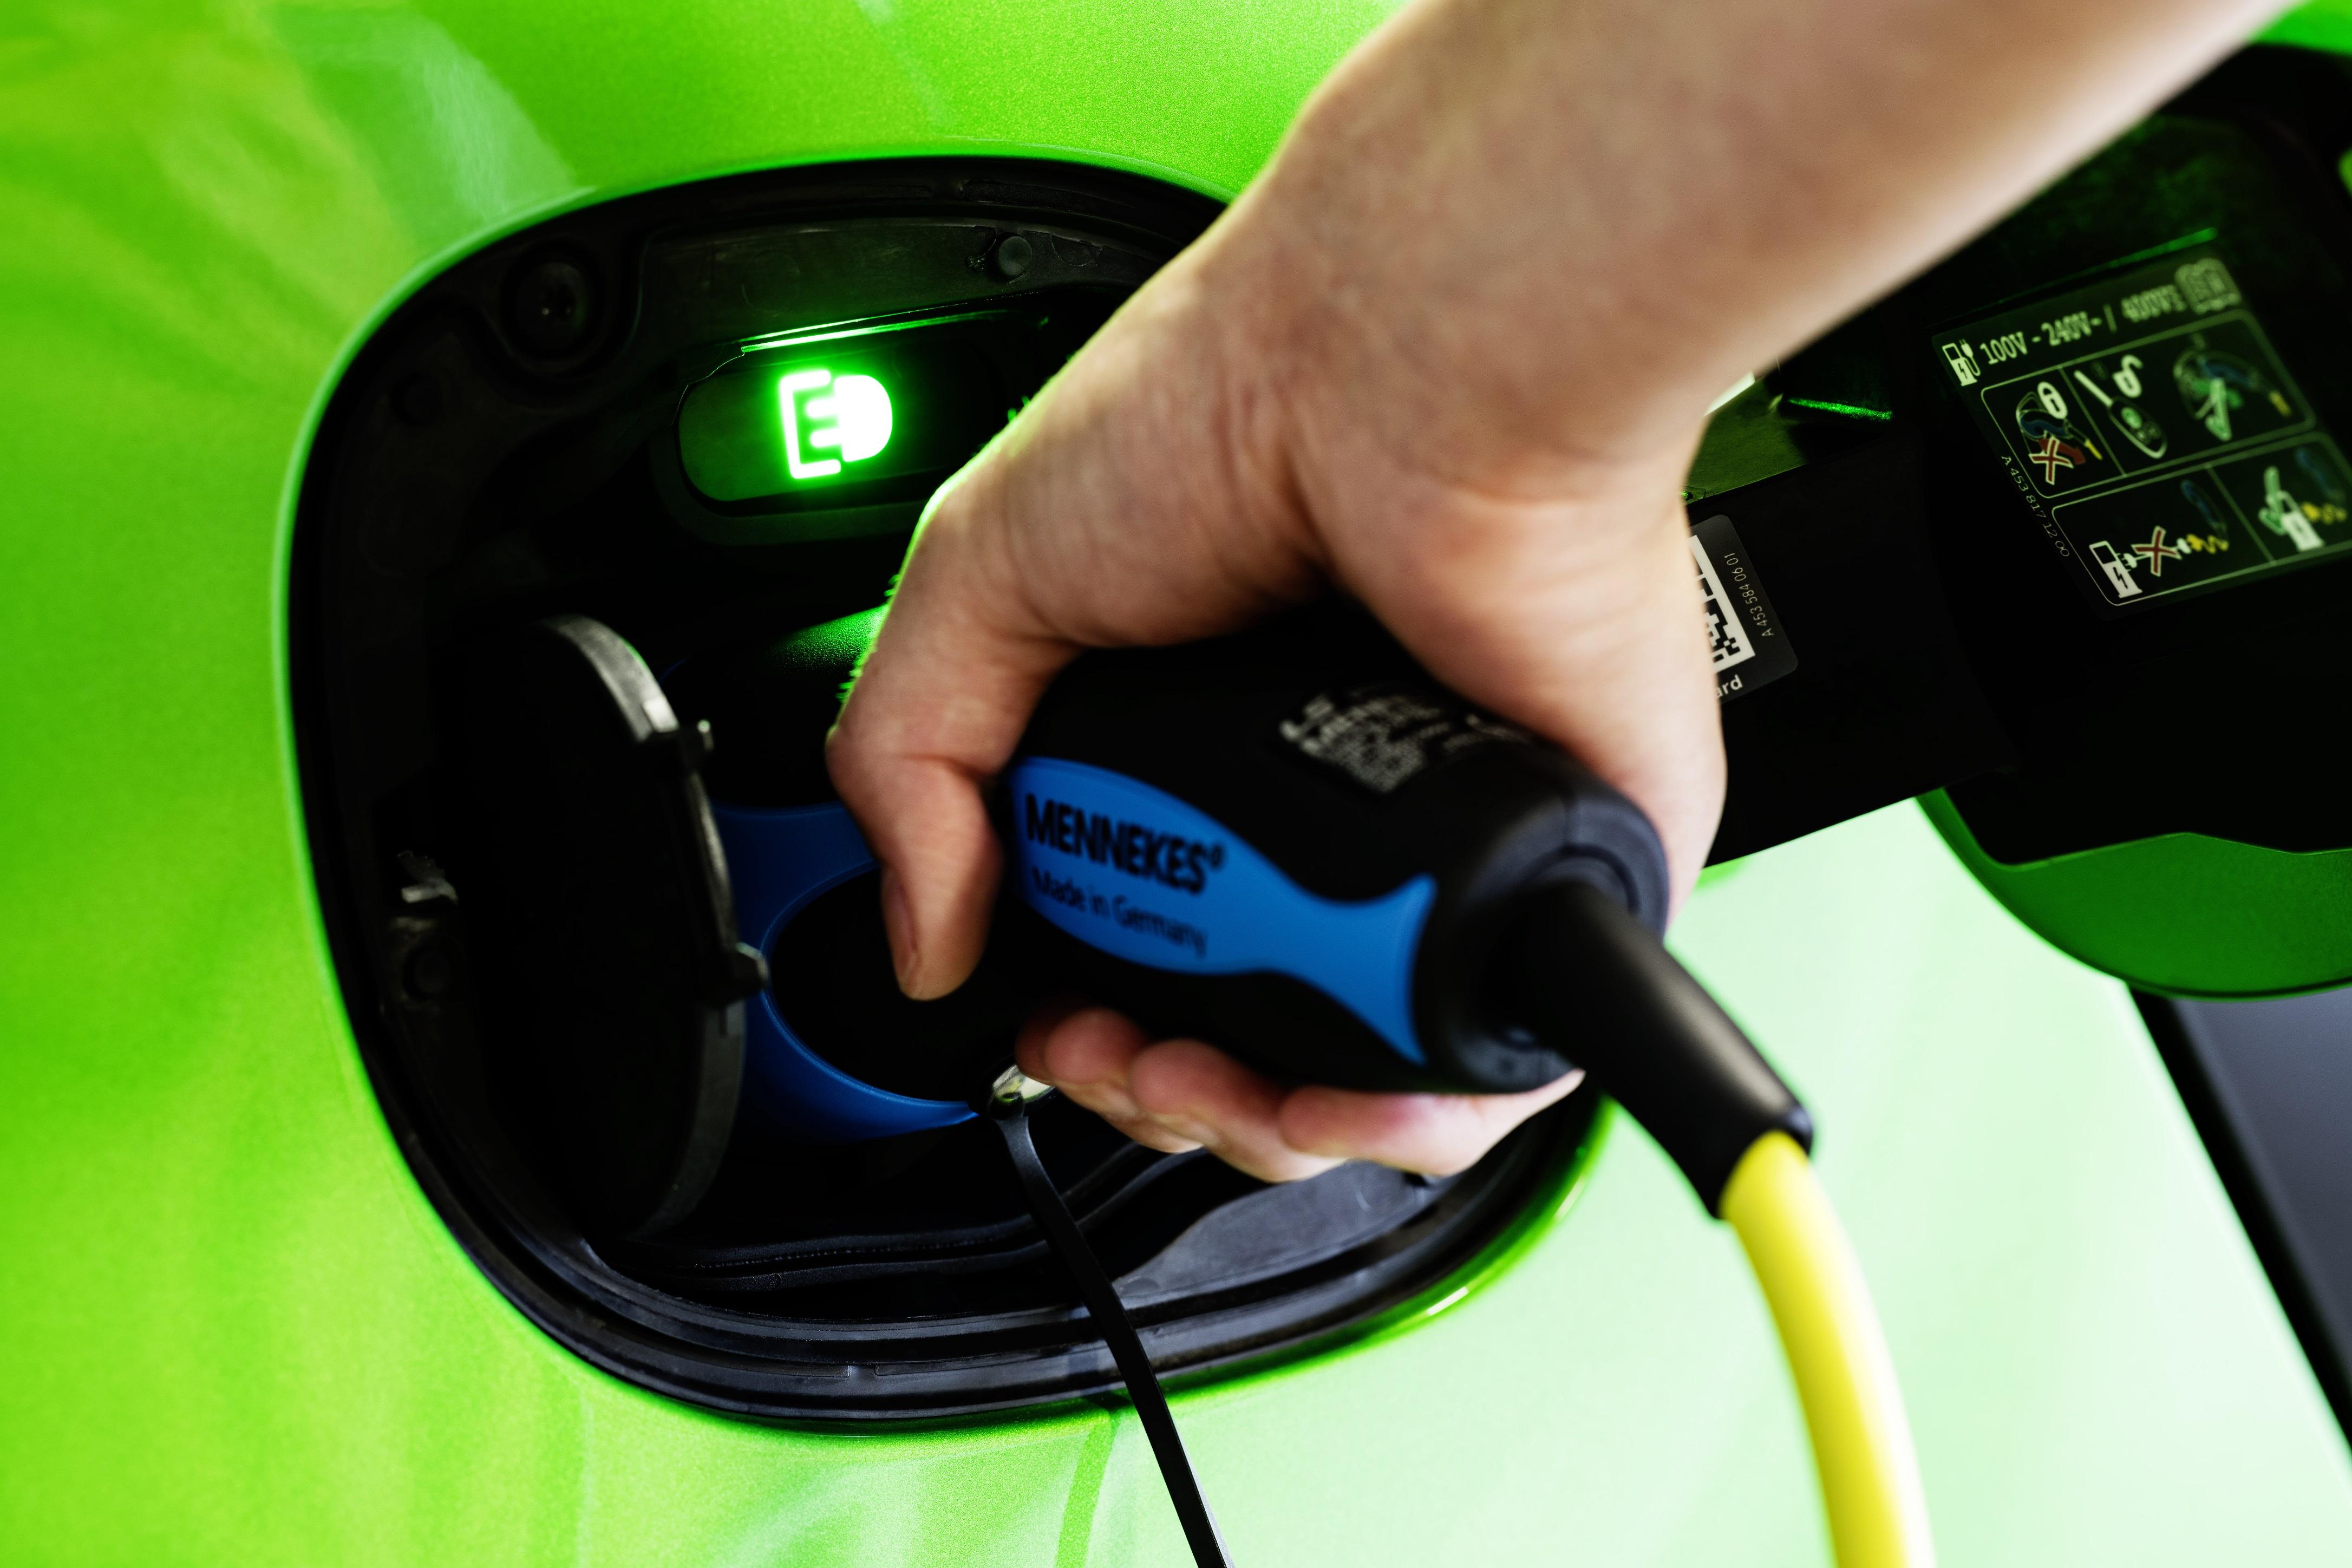 Carros elétricos acima de 60.000€ perdem apoio estatal